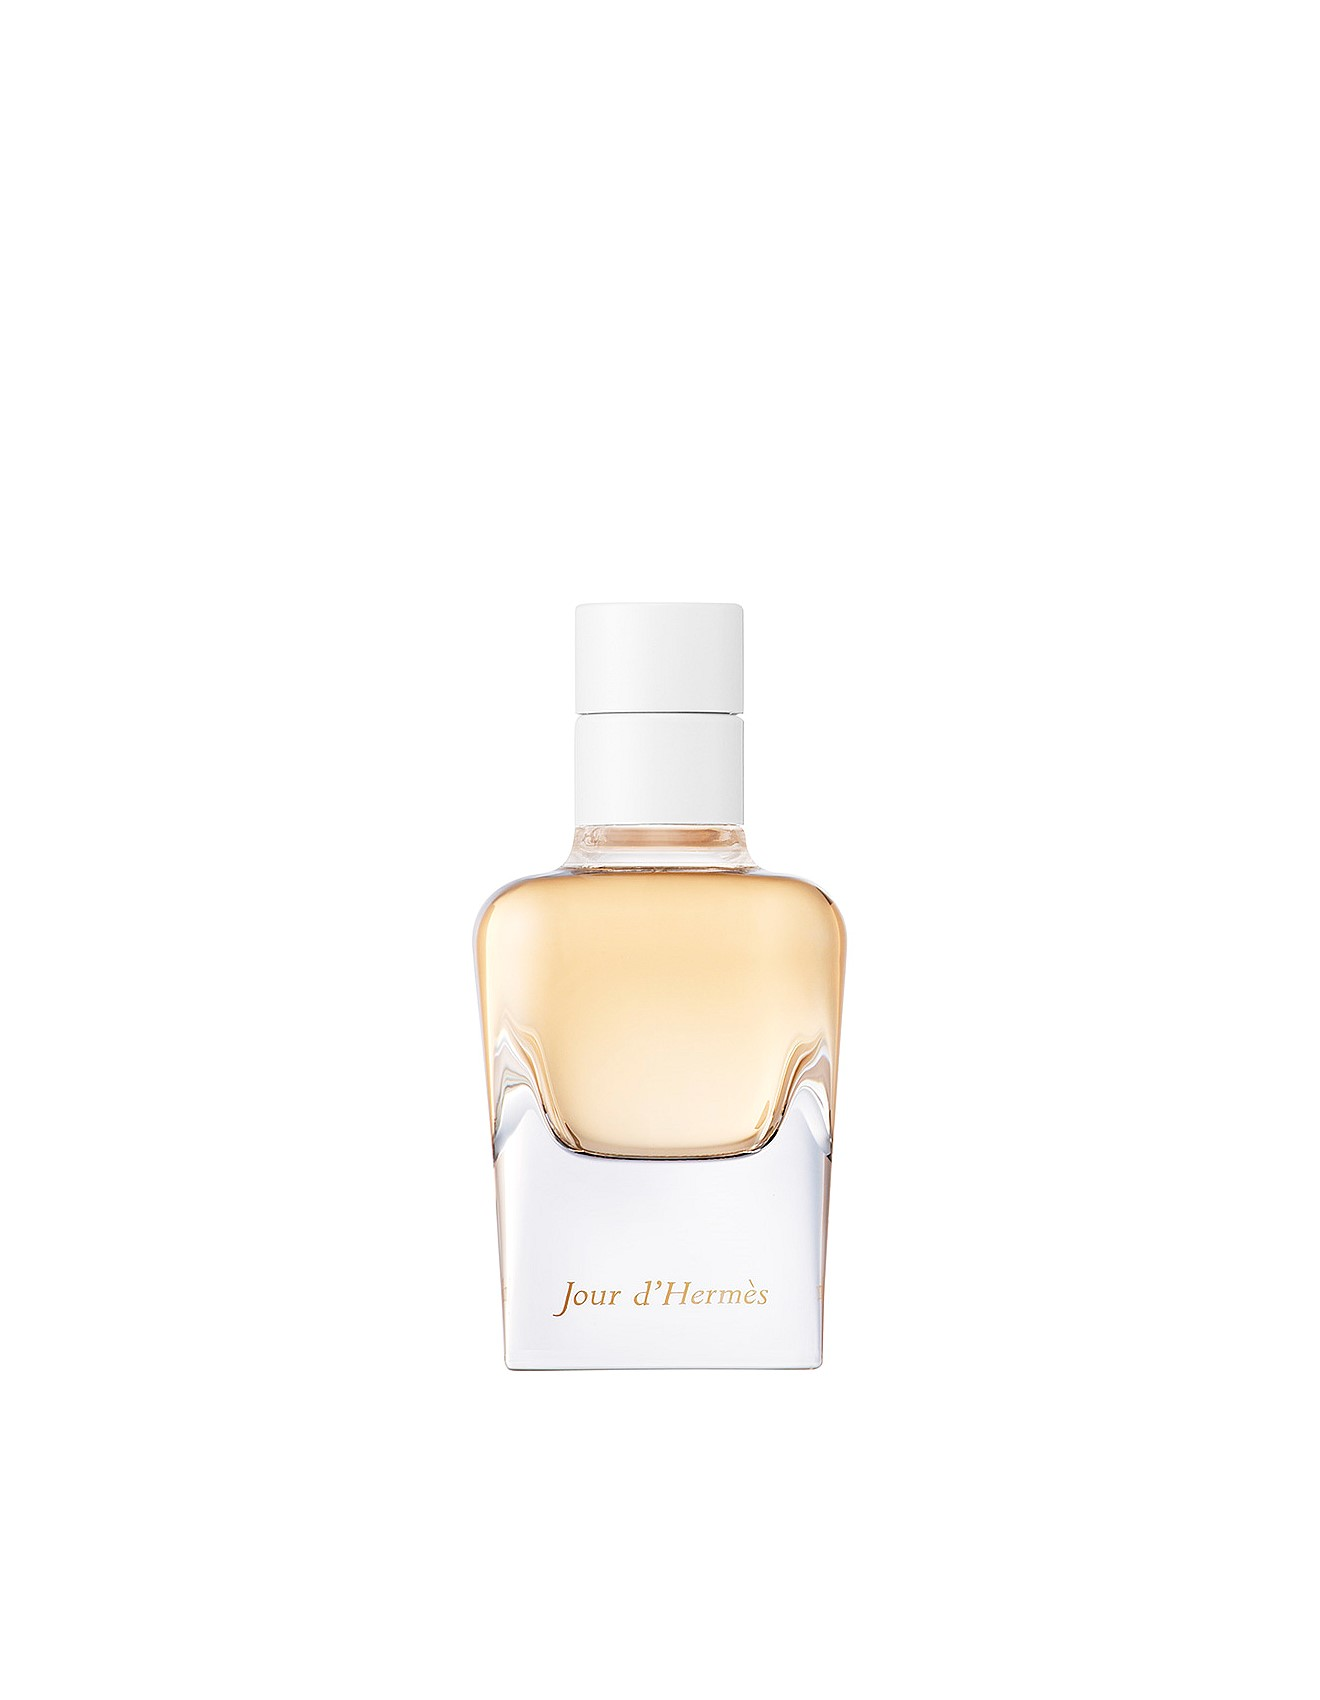 Hermès Buy Hermès Perfume More Online David Jones Jour D